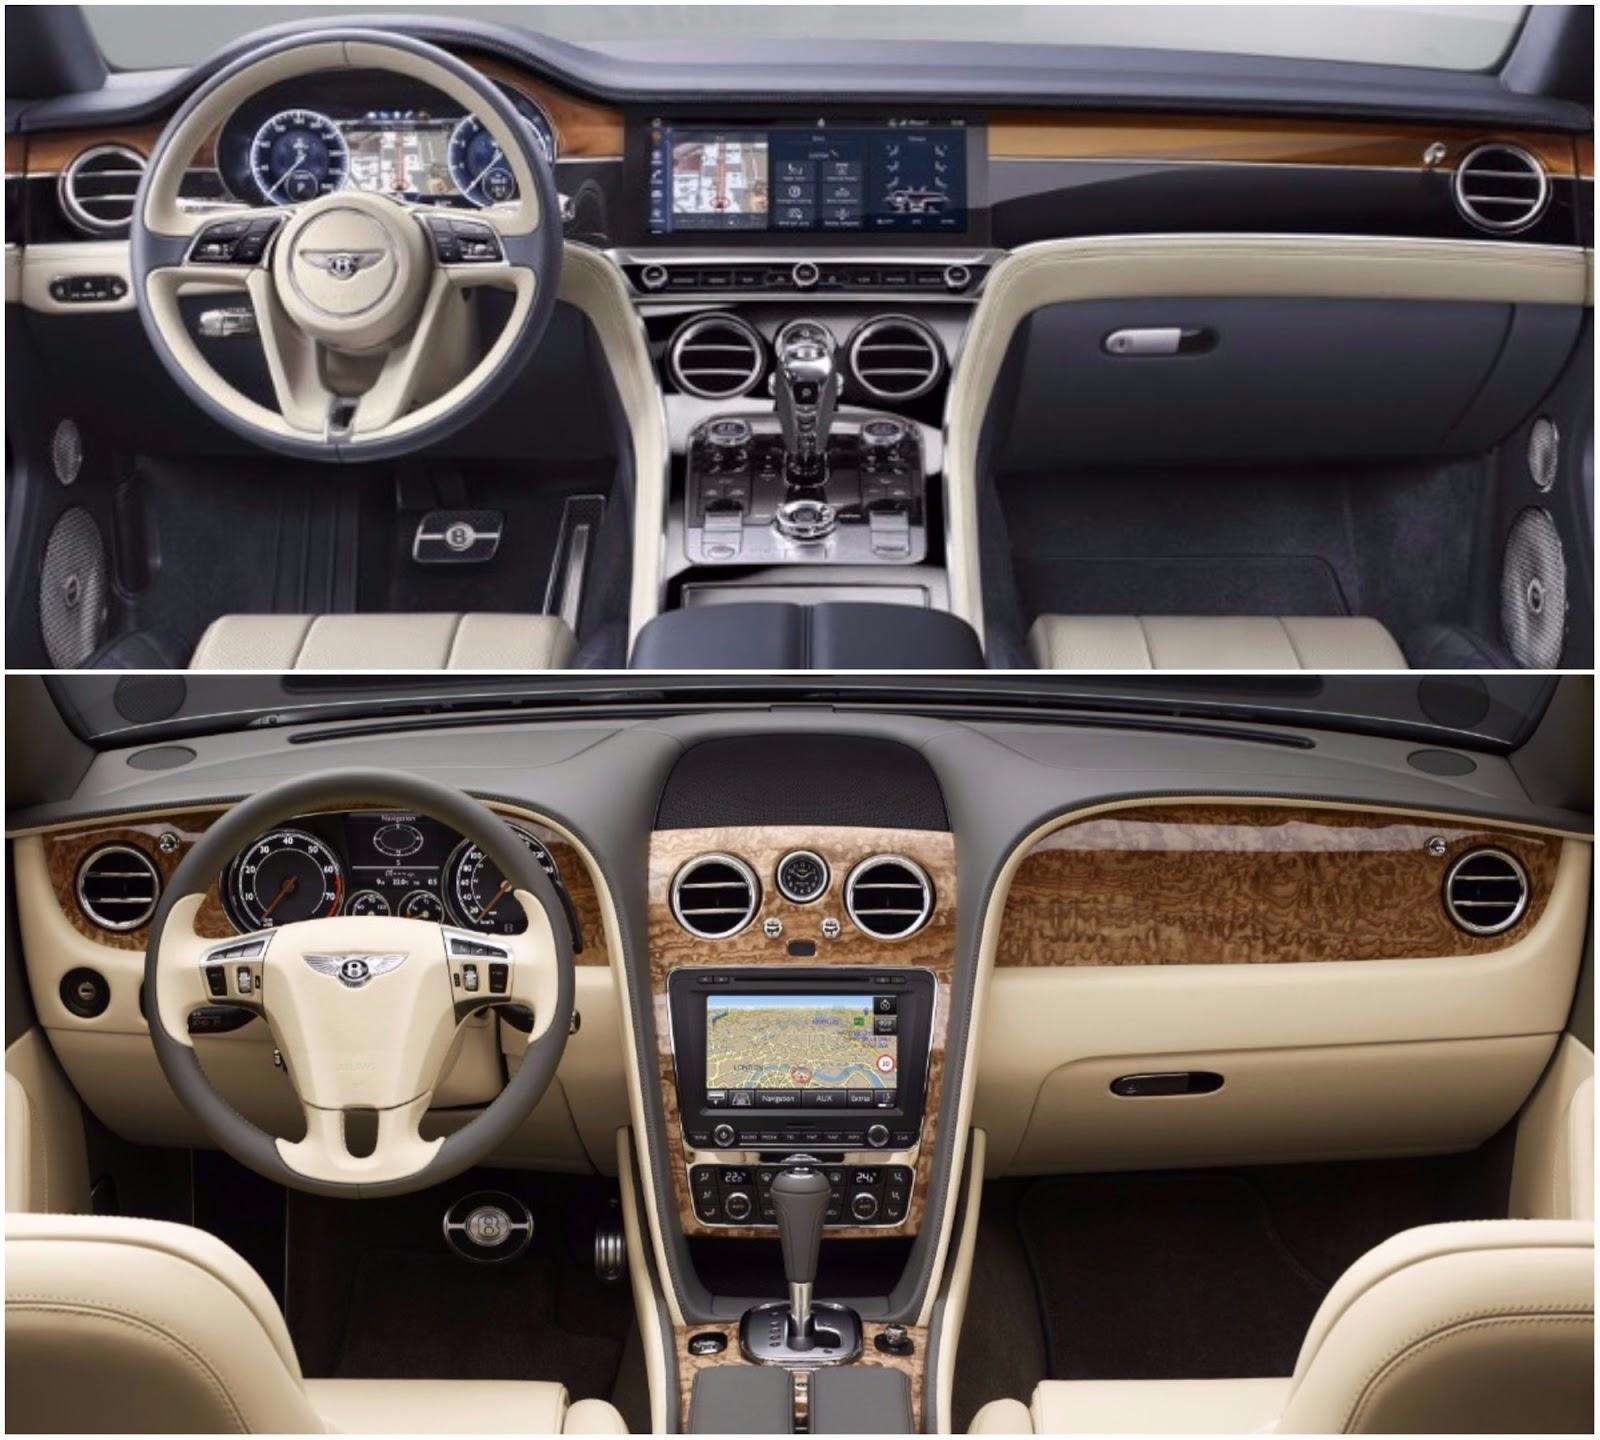 The All New 2018 Bentley Continental: Yeni Bentley Continental GT Tanıtıldı